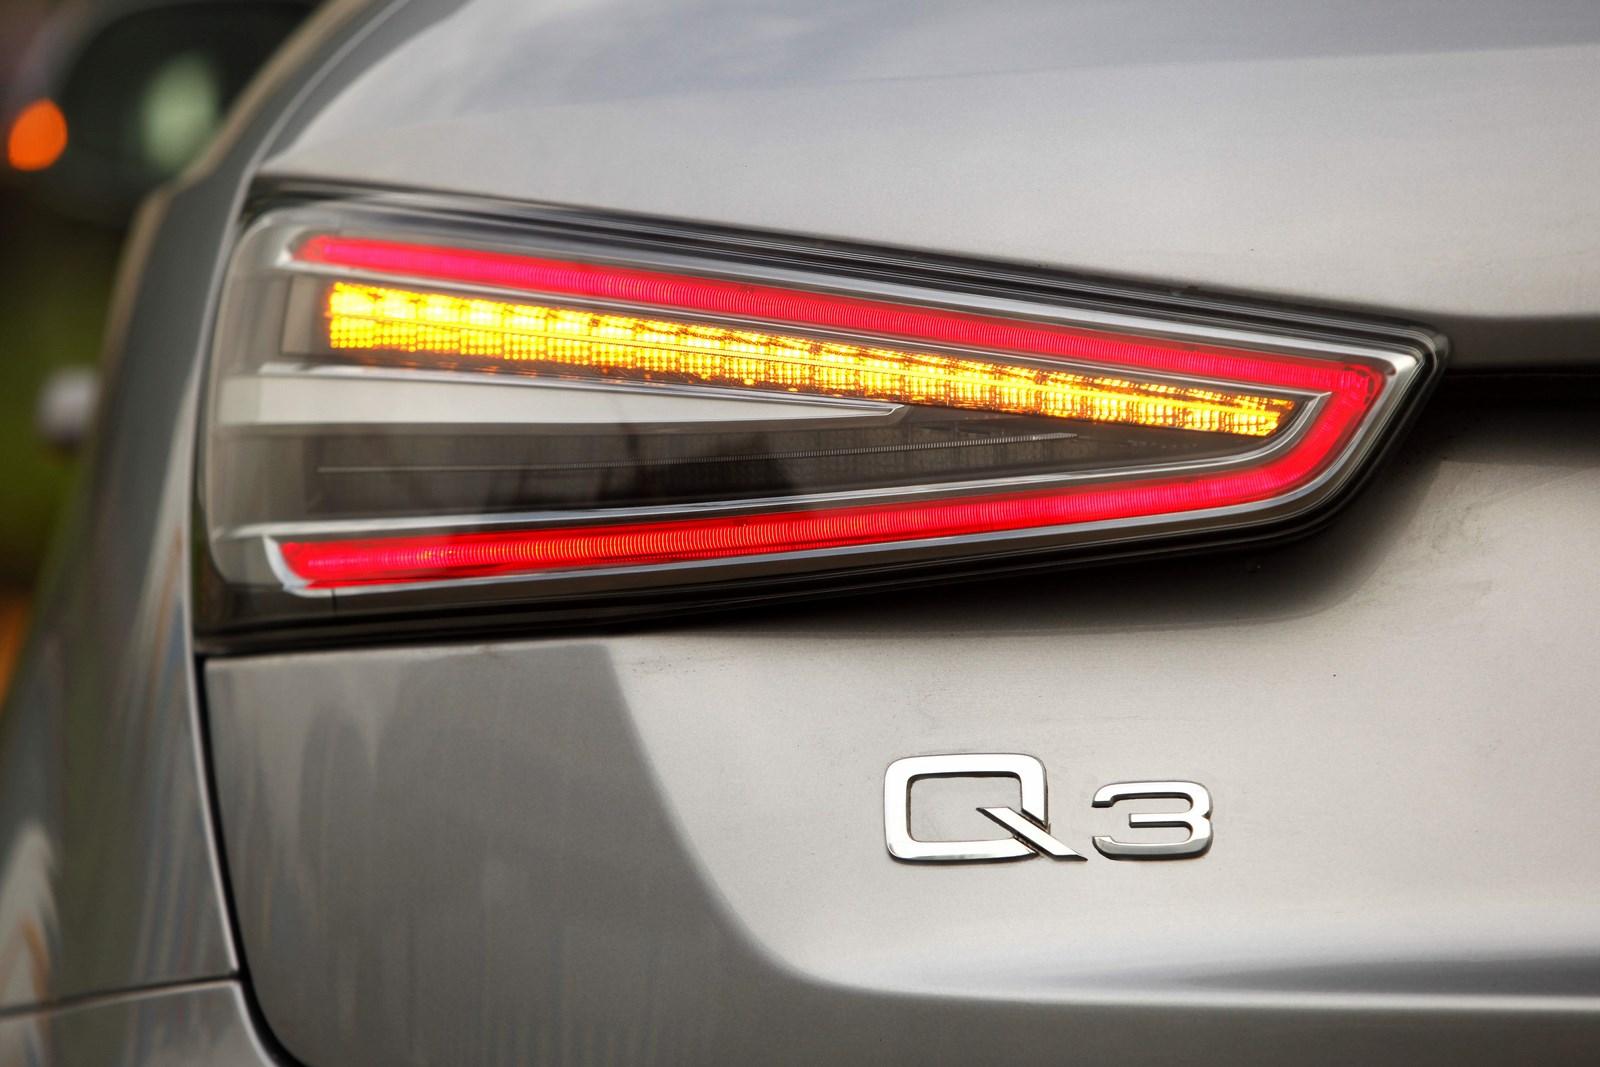 Audi Q3 Dynamic Clear Lens LED tail lamp